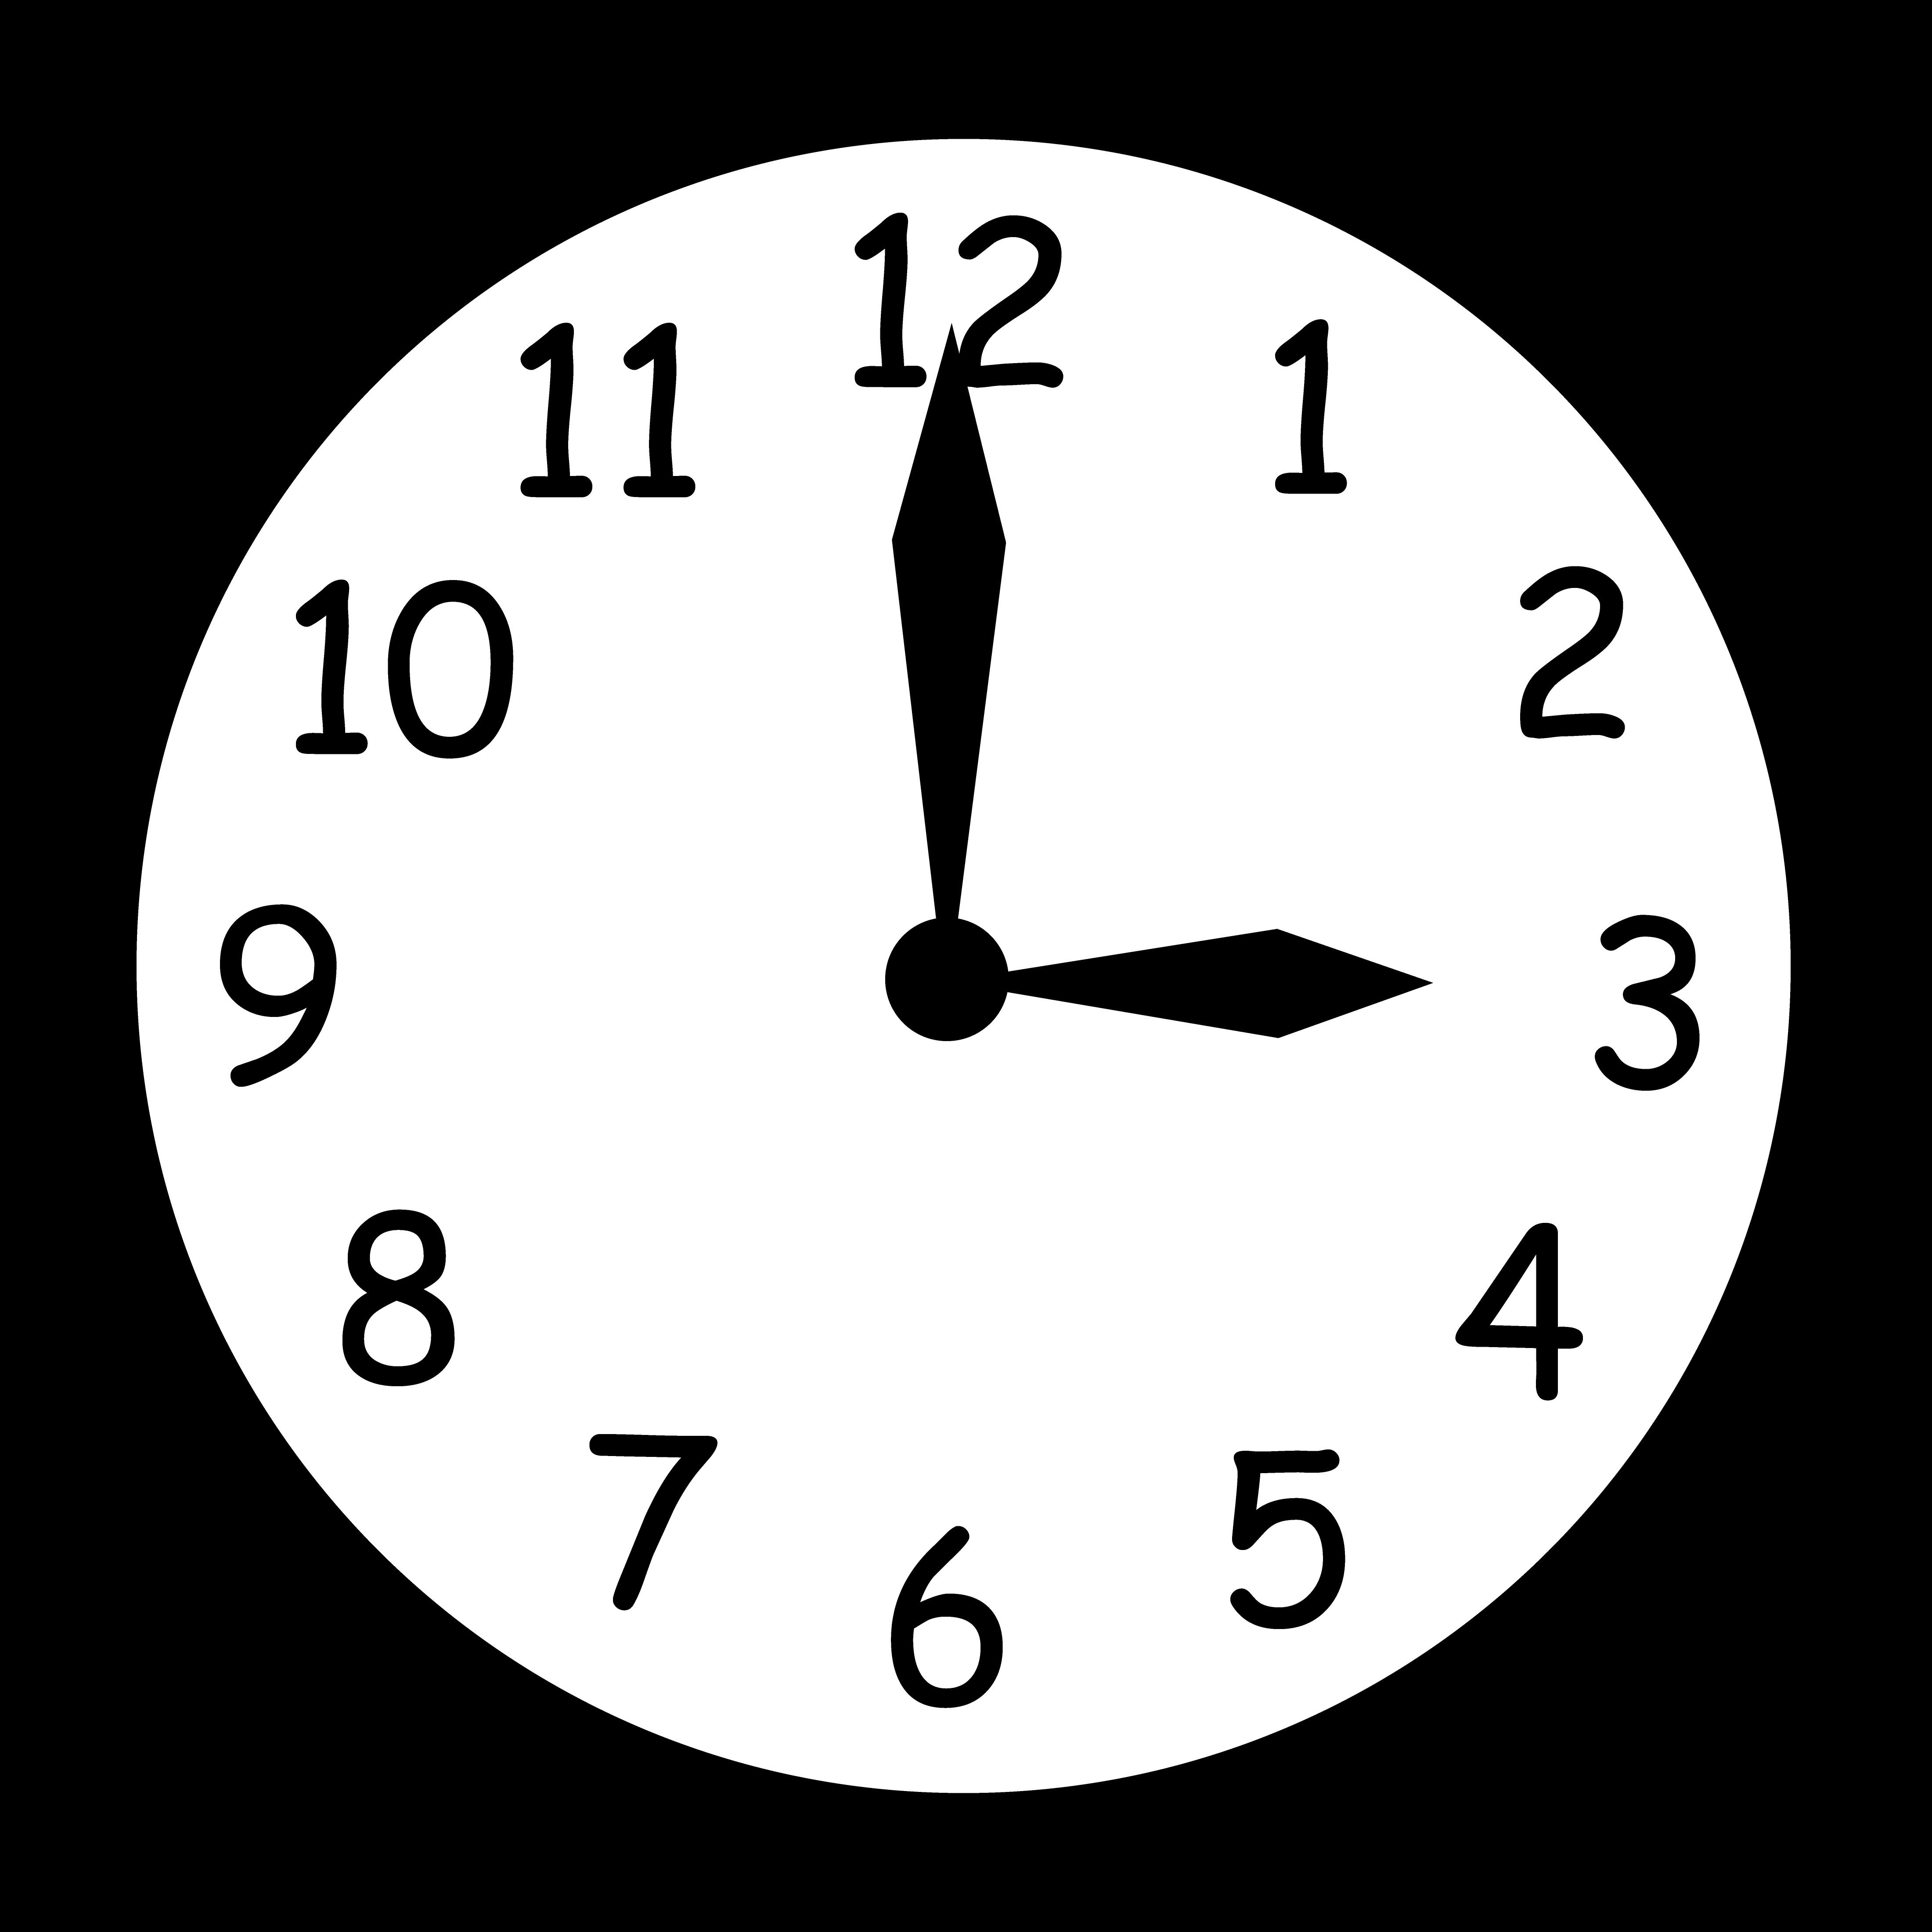 Clock clipart #6, Download drawings